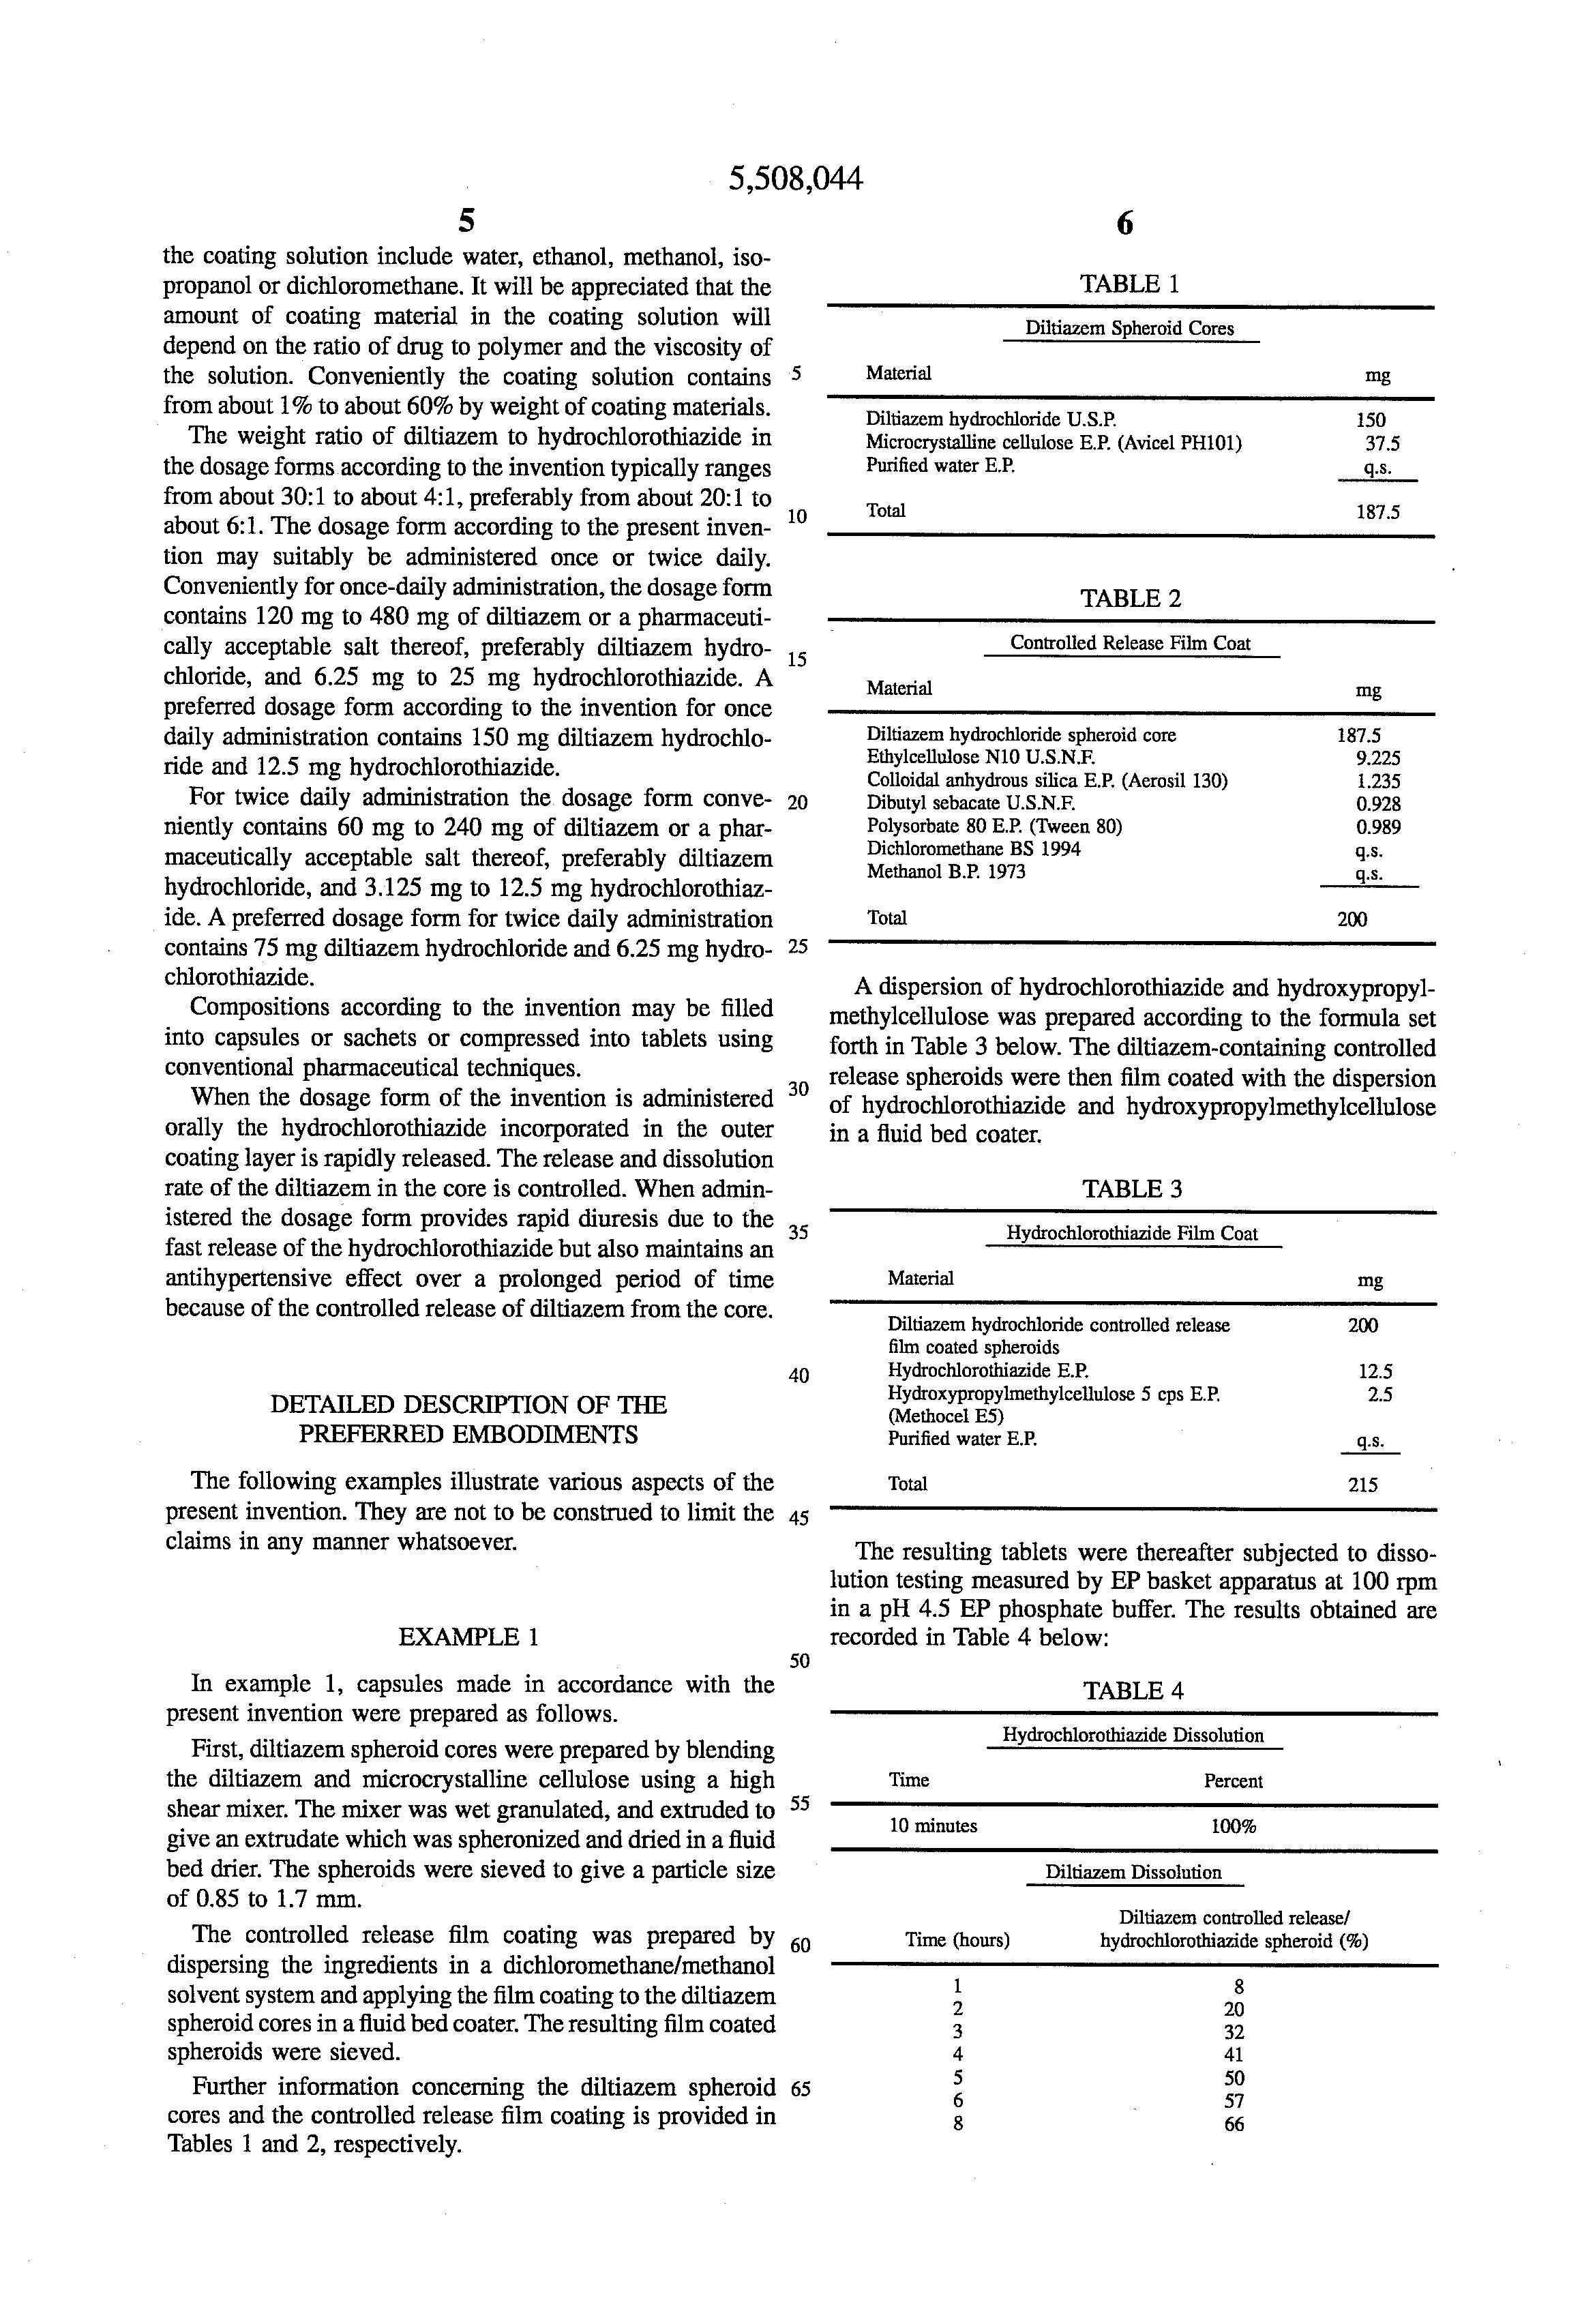 Cardizem Dosage Forms